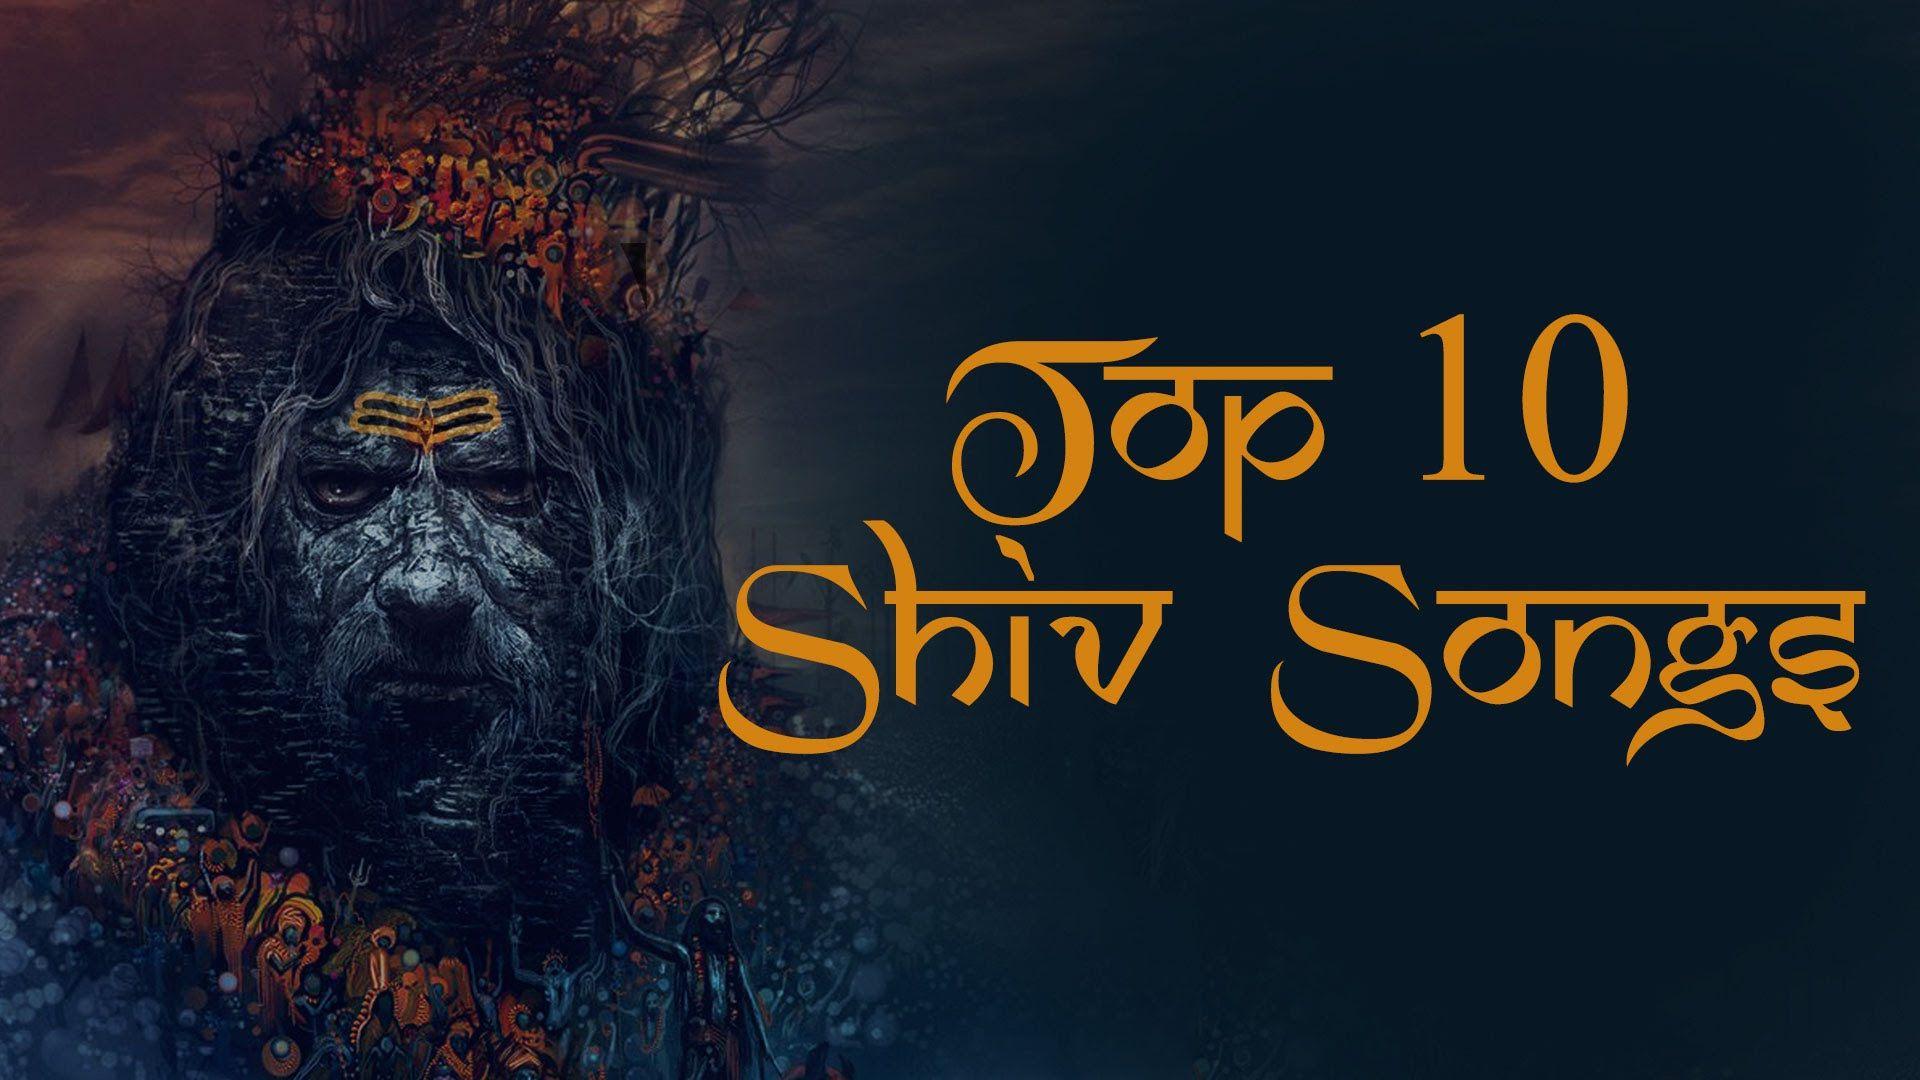 Top 10 Shiva Songs Mrityunjaya Maha Mantra Lingashtakam Shiva Tandava Stotram Sri Rudram Shiva Songs Songs Shiva